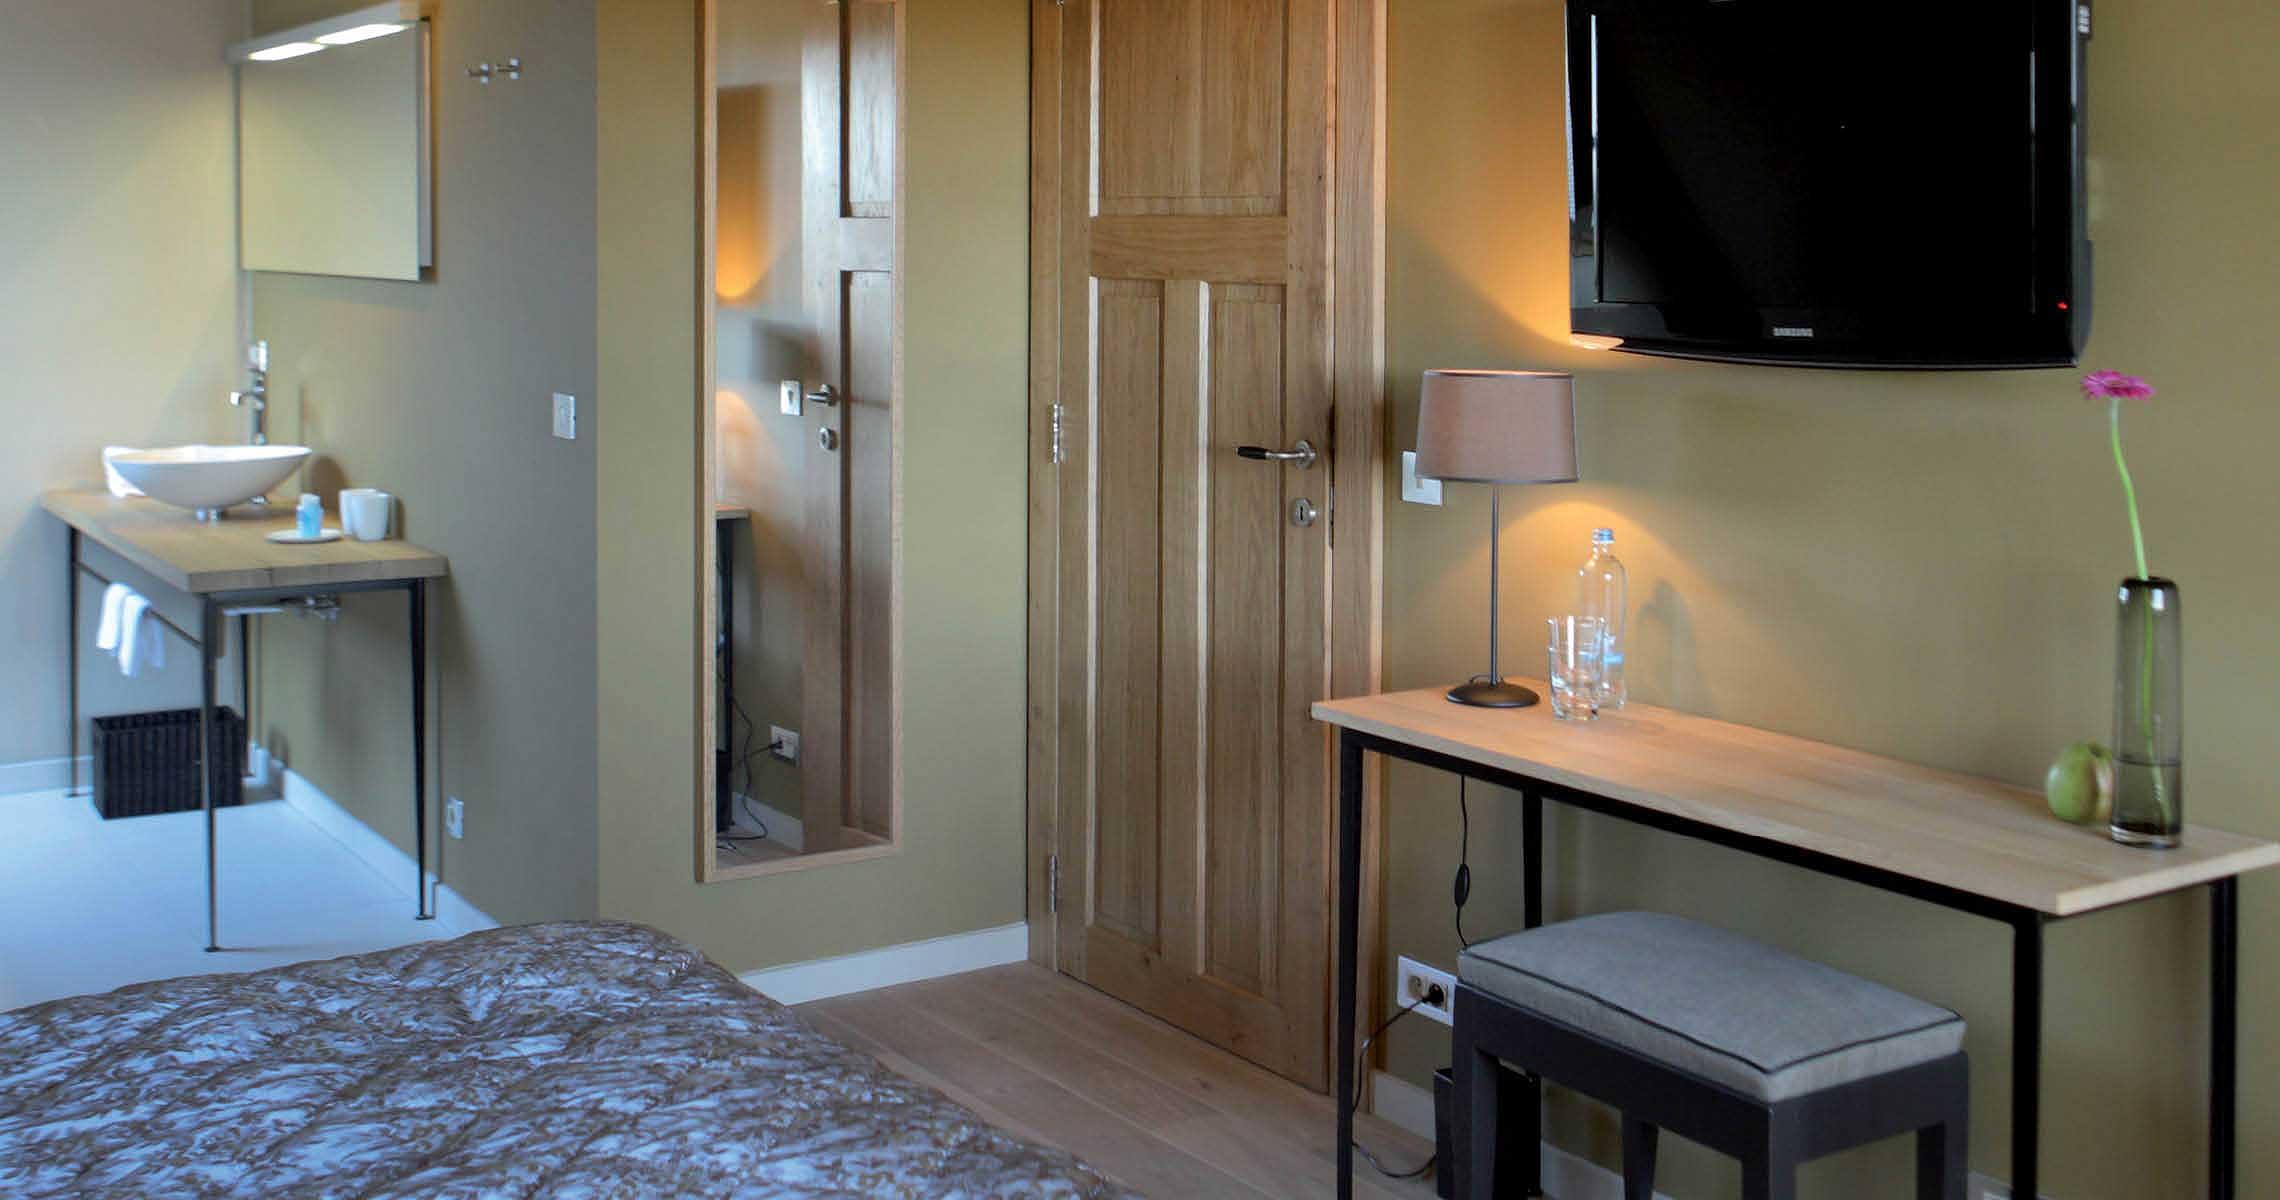 Cosy double bedroom flatscreen tv